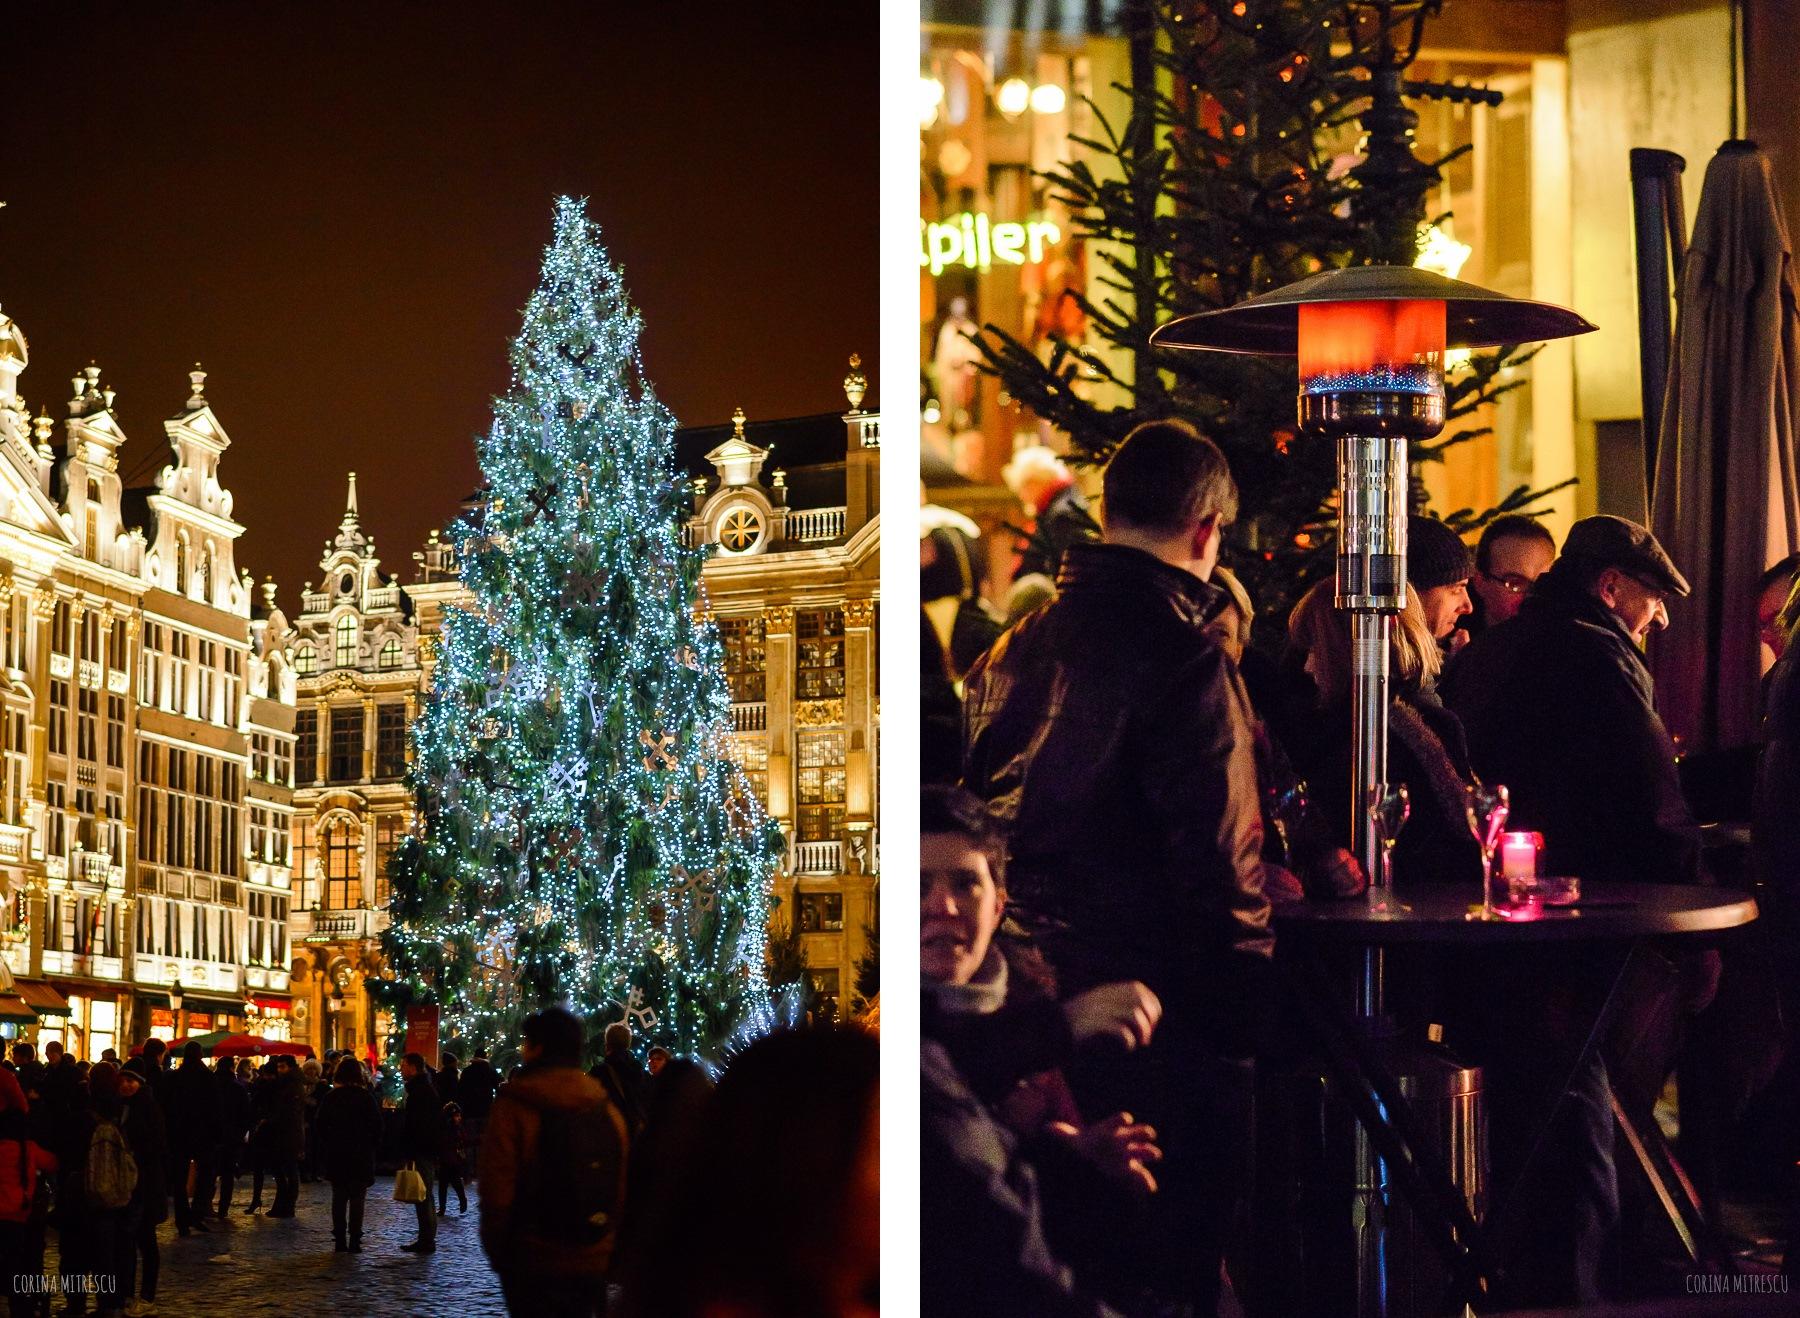 #B28419 Christmas 2014 In Brussels Belgium PhotoCory 5353 decorations de noel bruxelles 1800x1318 px @ aertt.com